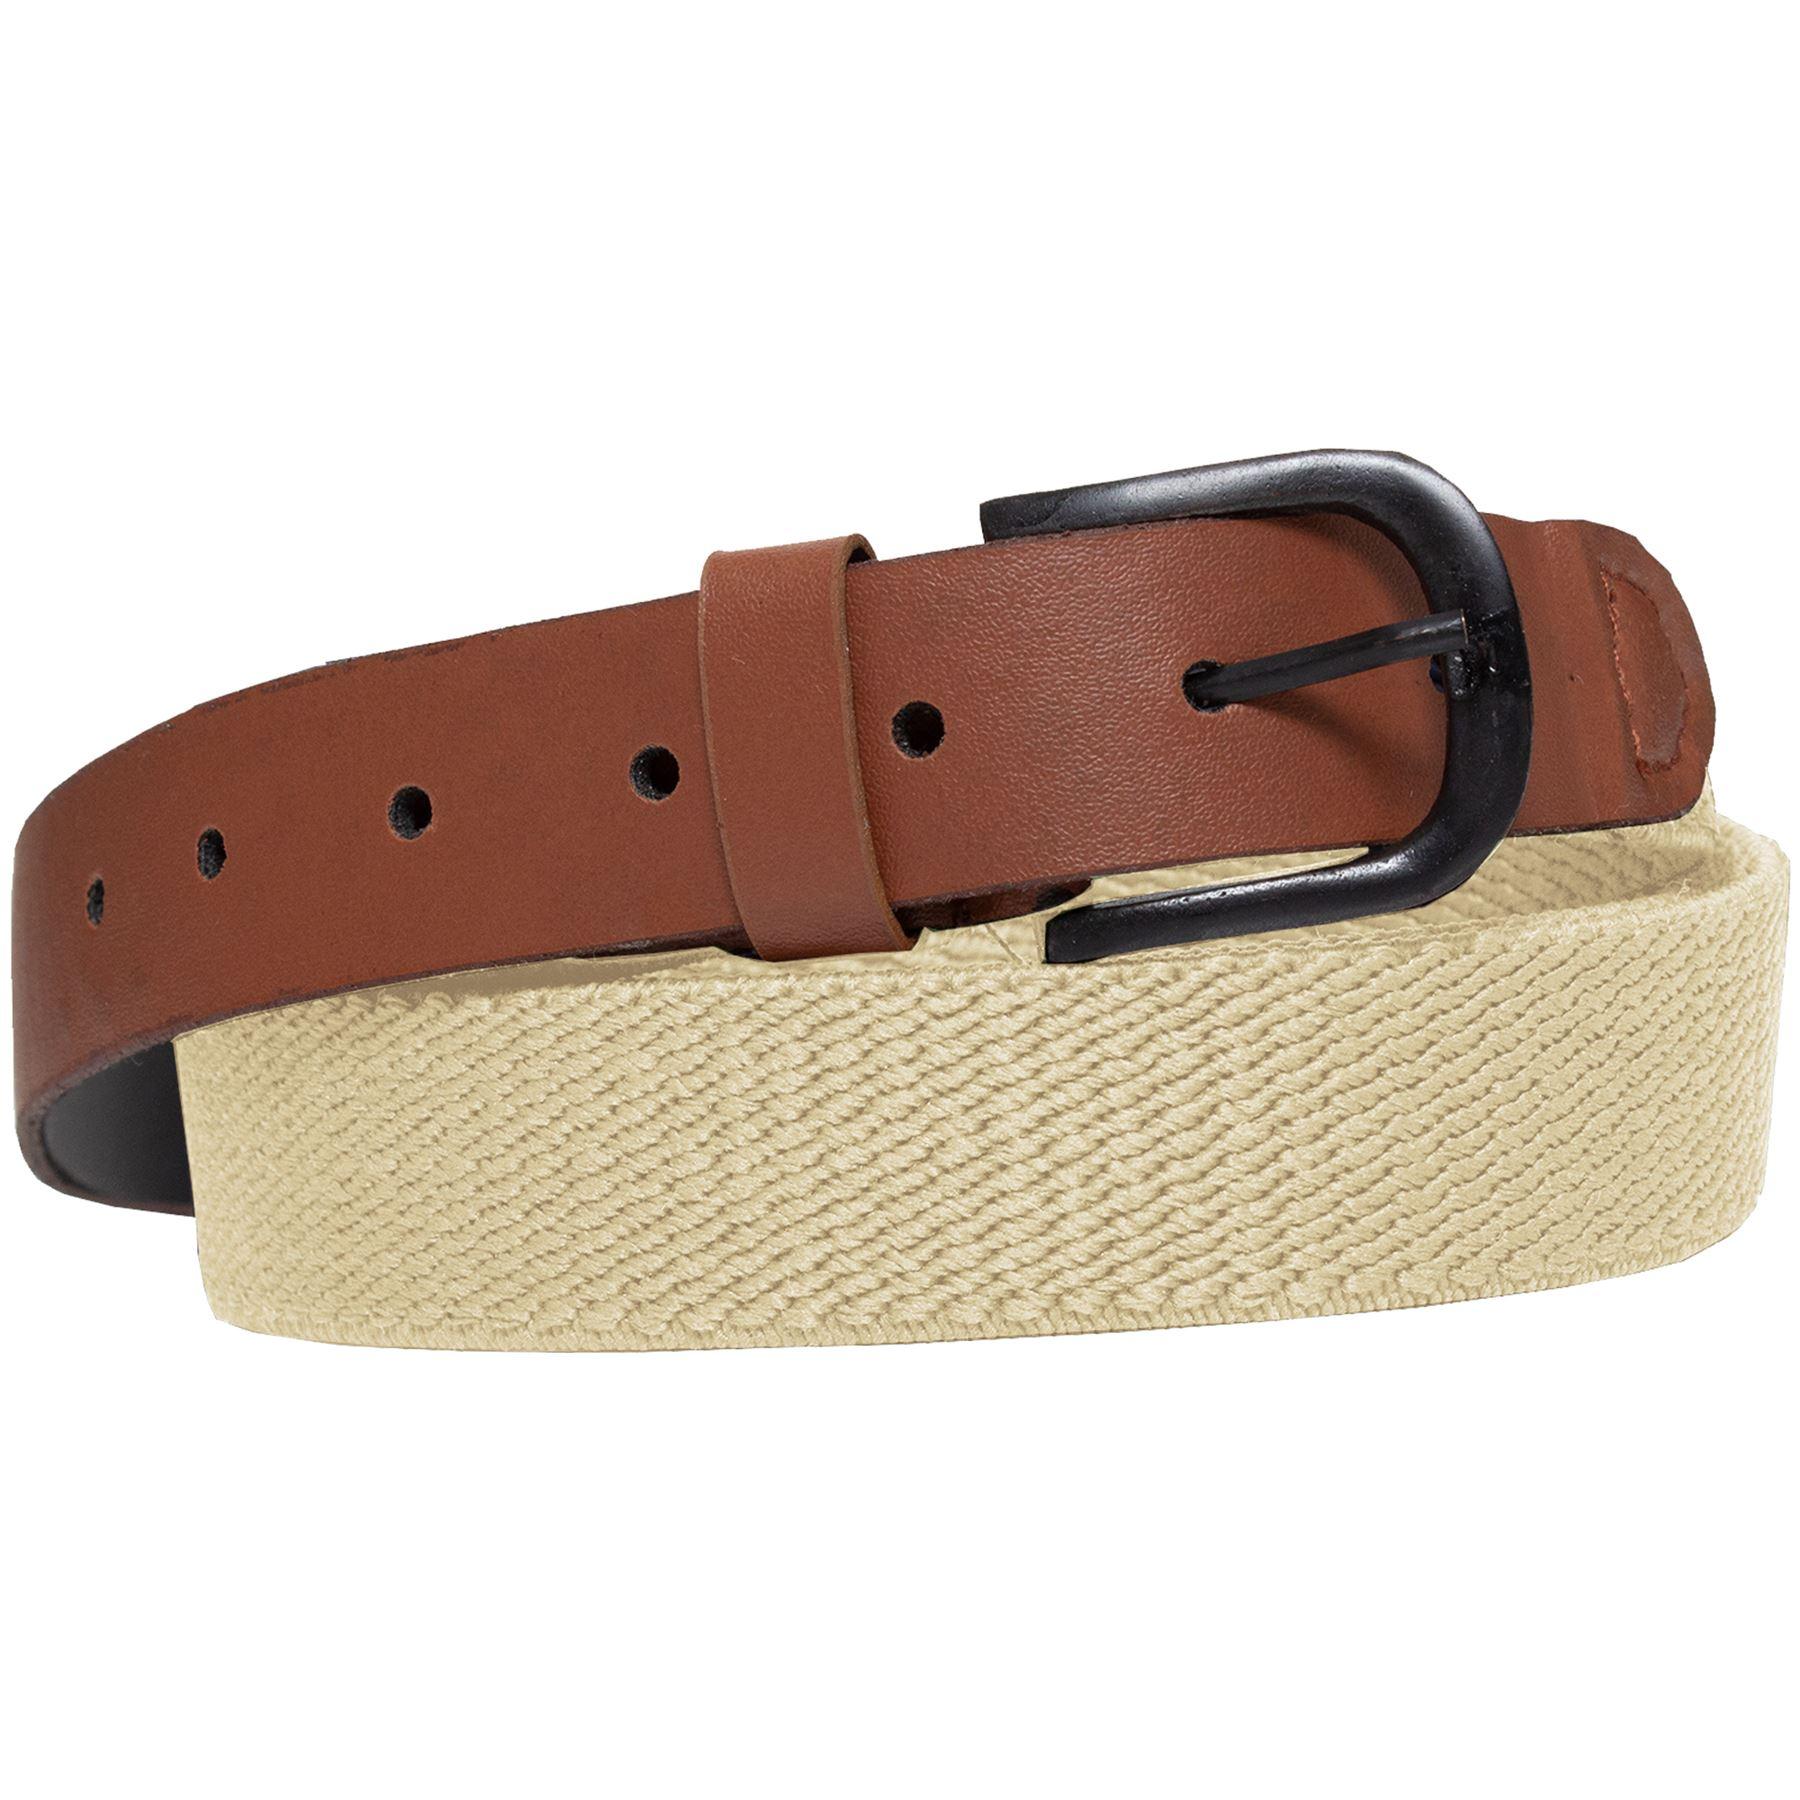 ENZO-Mens-Womens-Elasticated-Belts-Canvas-Stretch-PU-Leather-Trim-Braided-Belt Indexbild 8